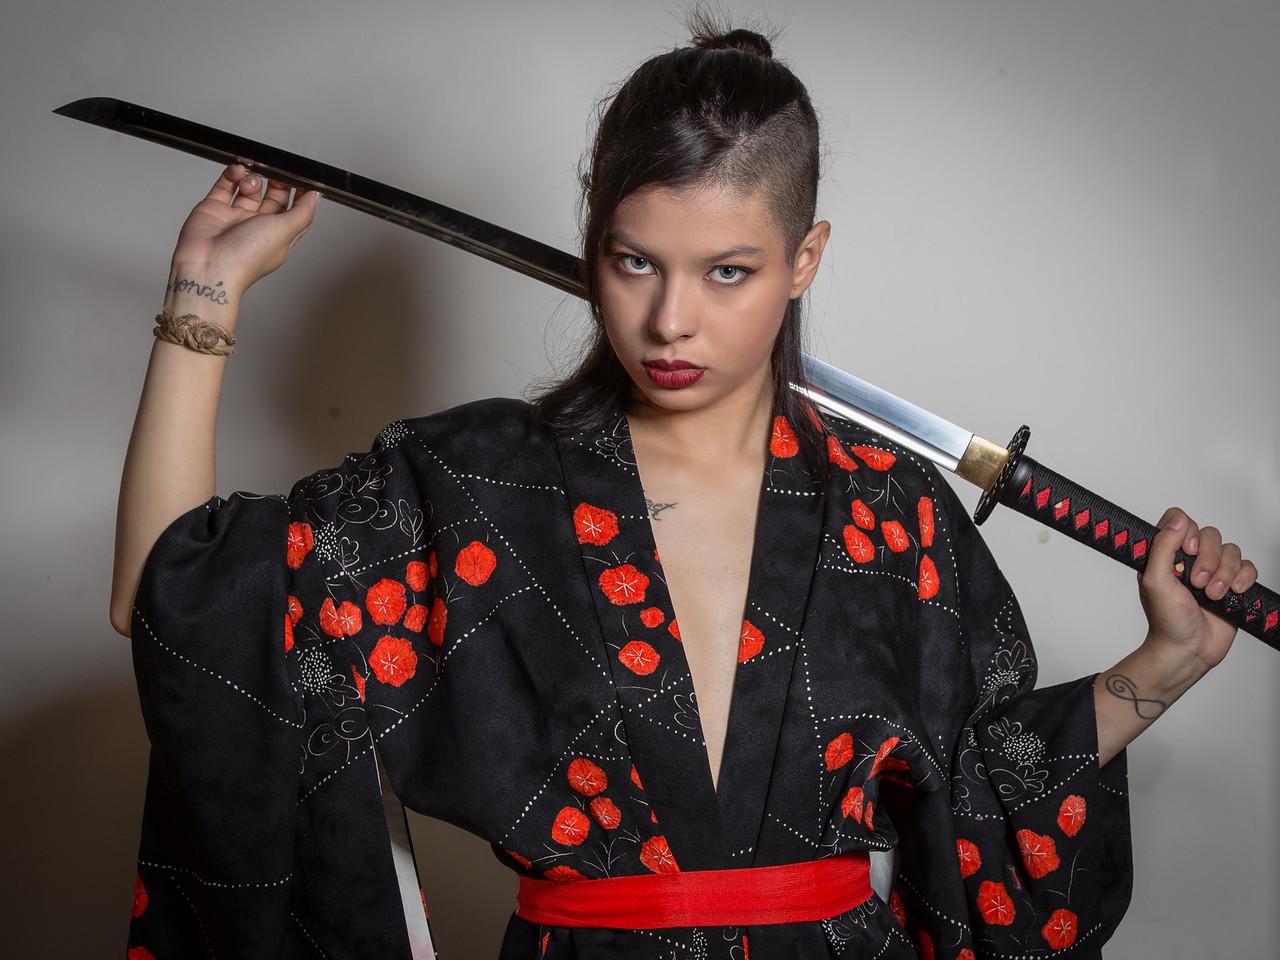 Samurai Liricaa Lamat